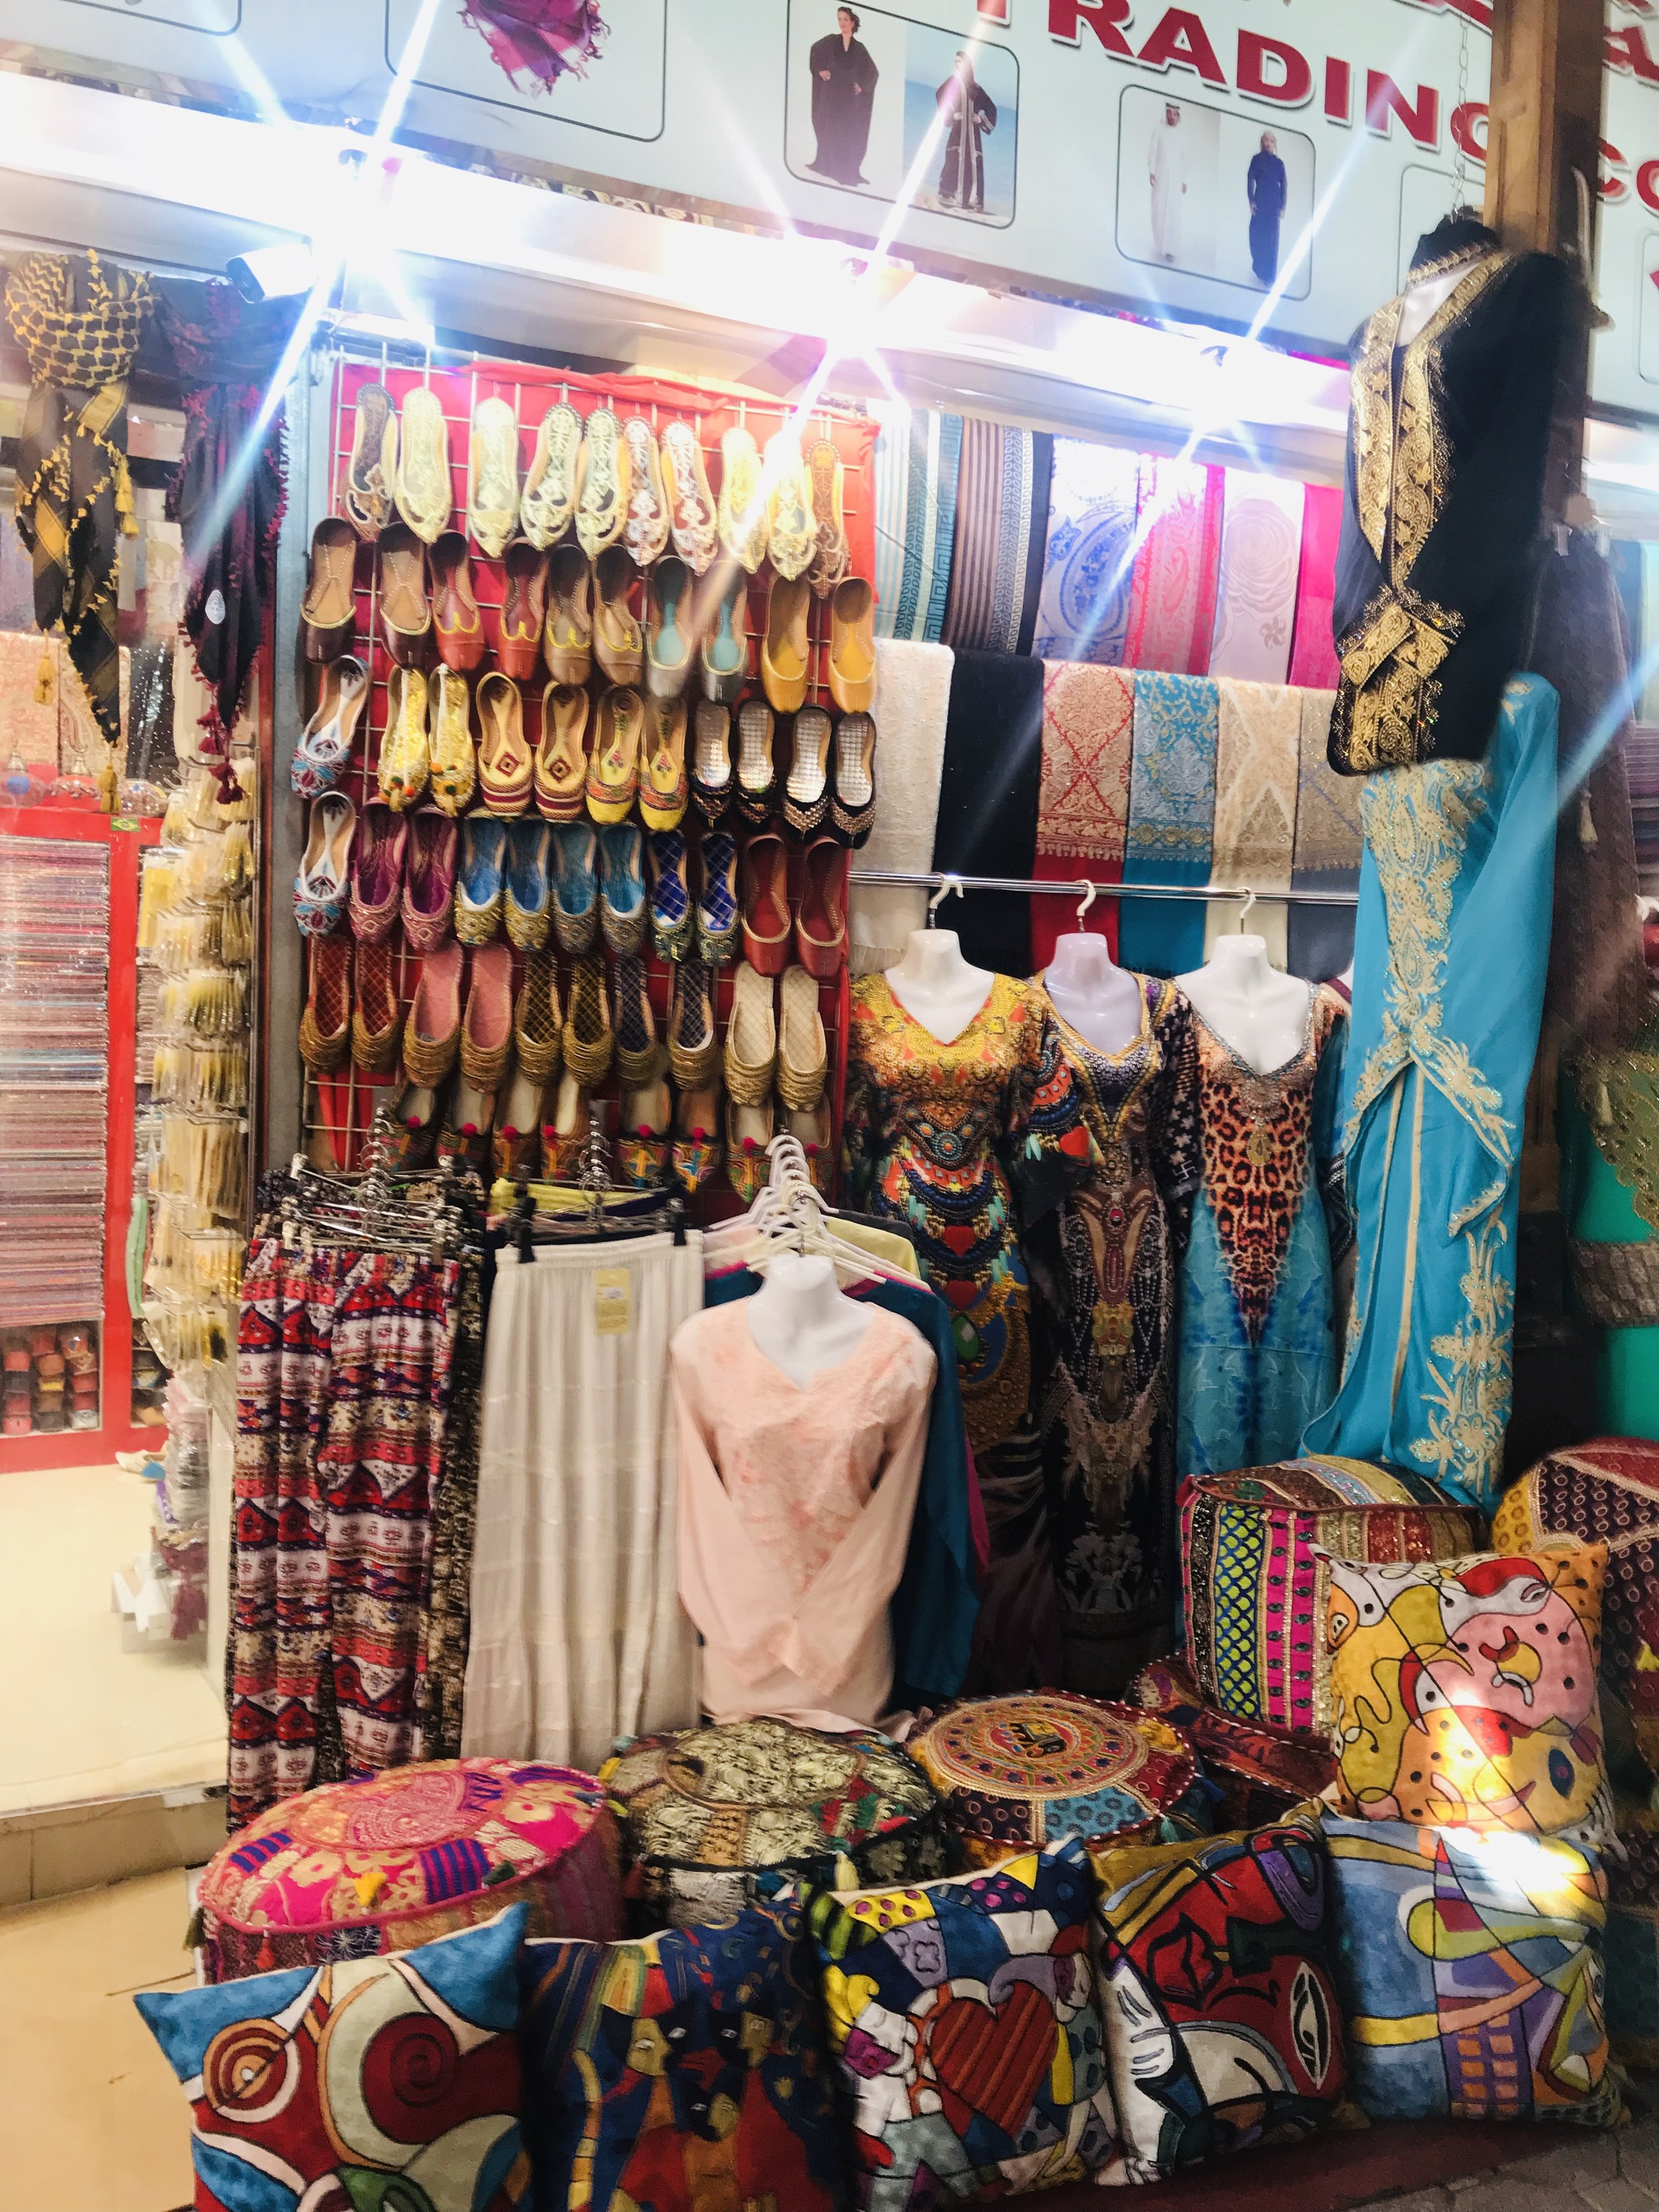 Shoes, pashminas, novelties and more